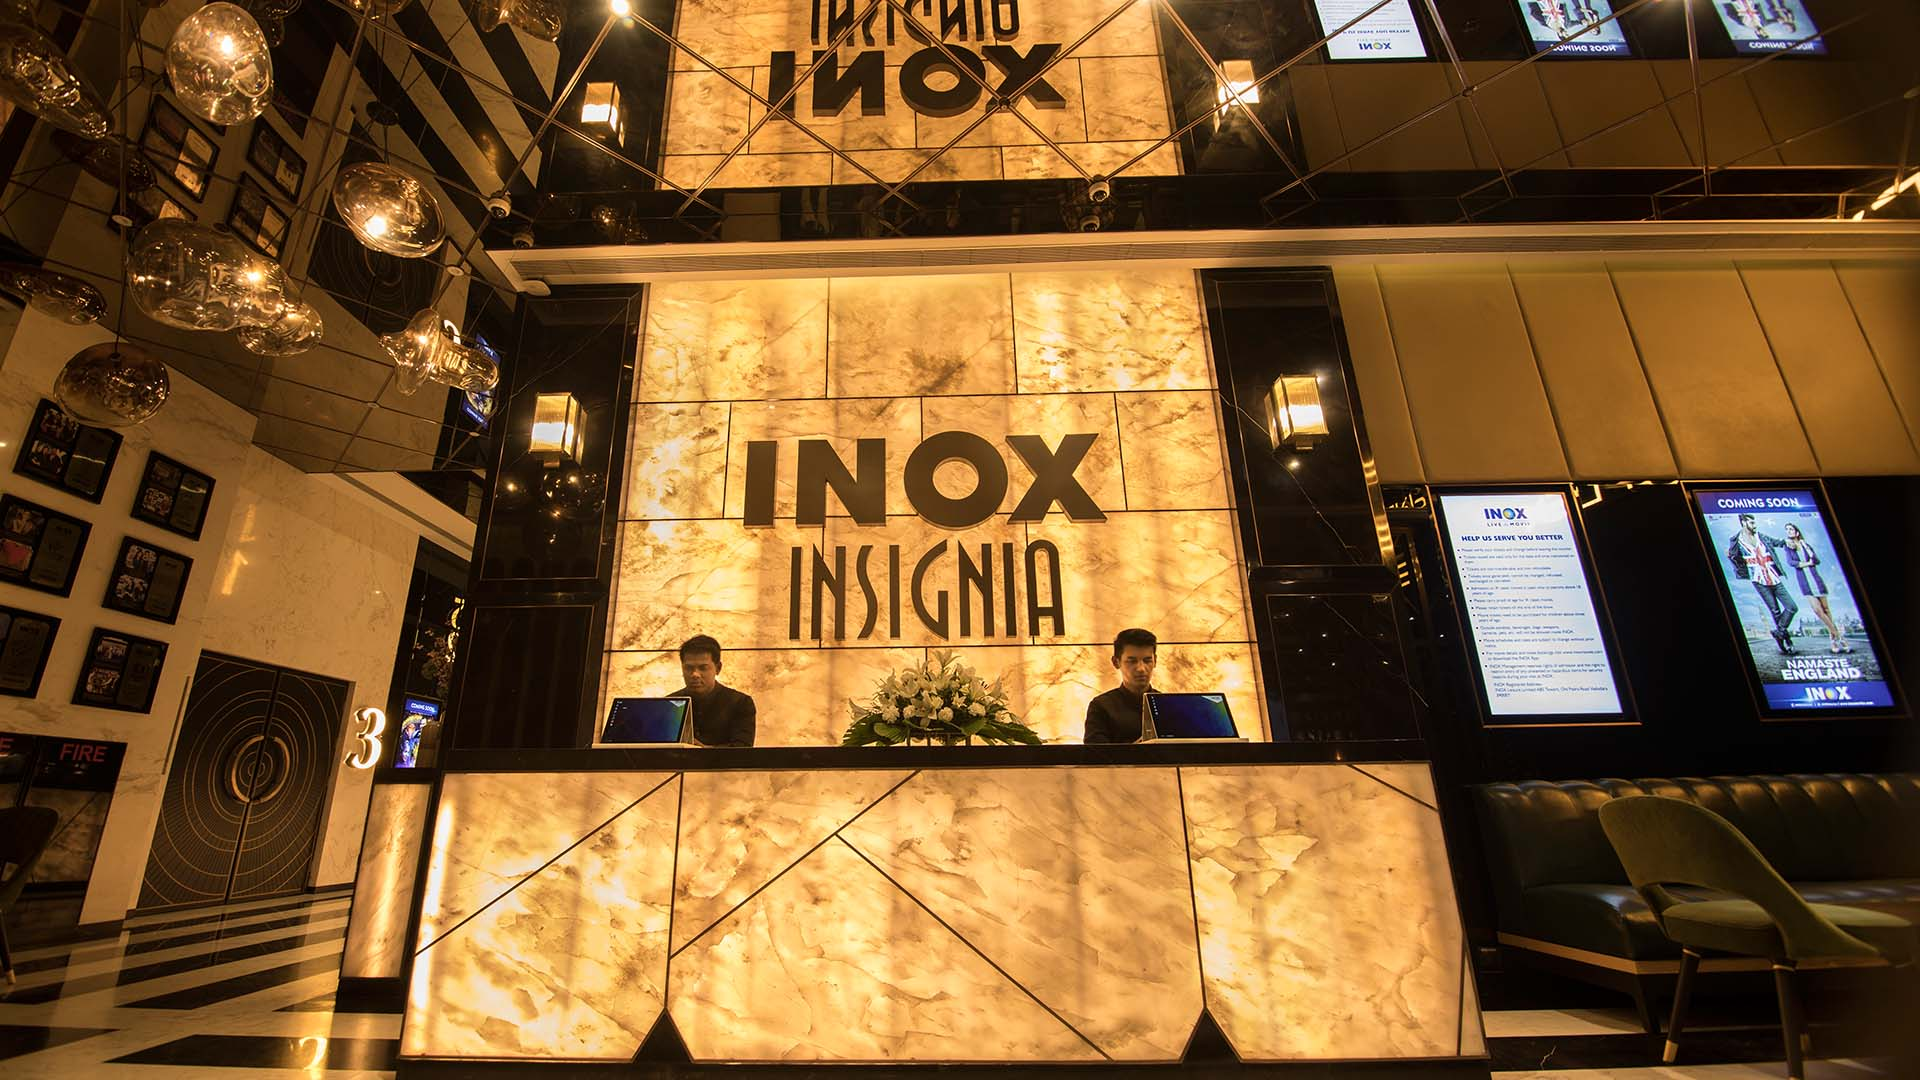 inox-insignia-photos-15